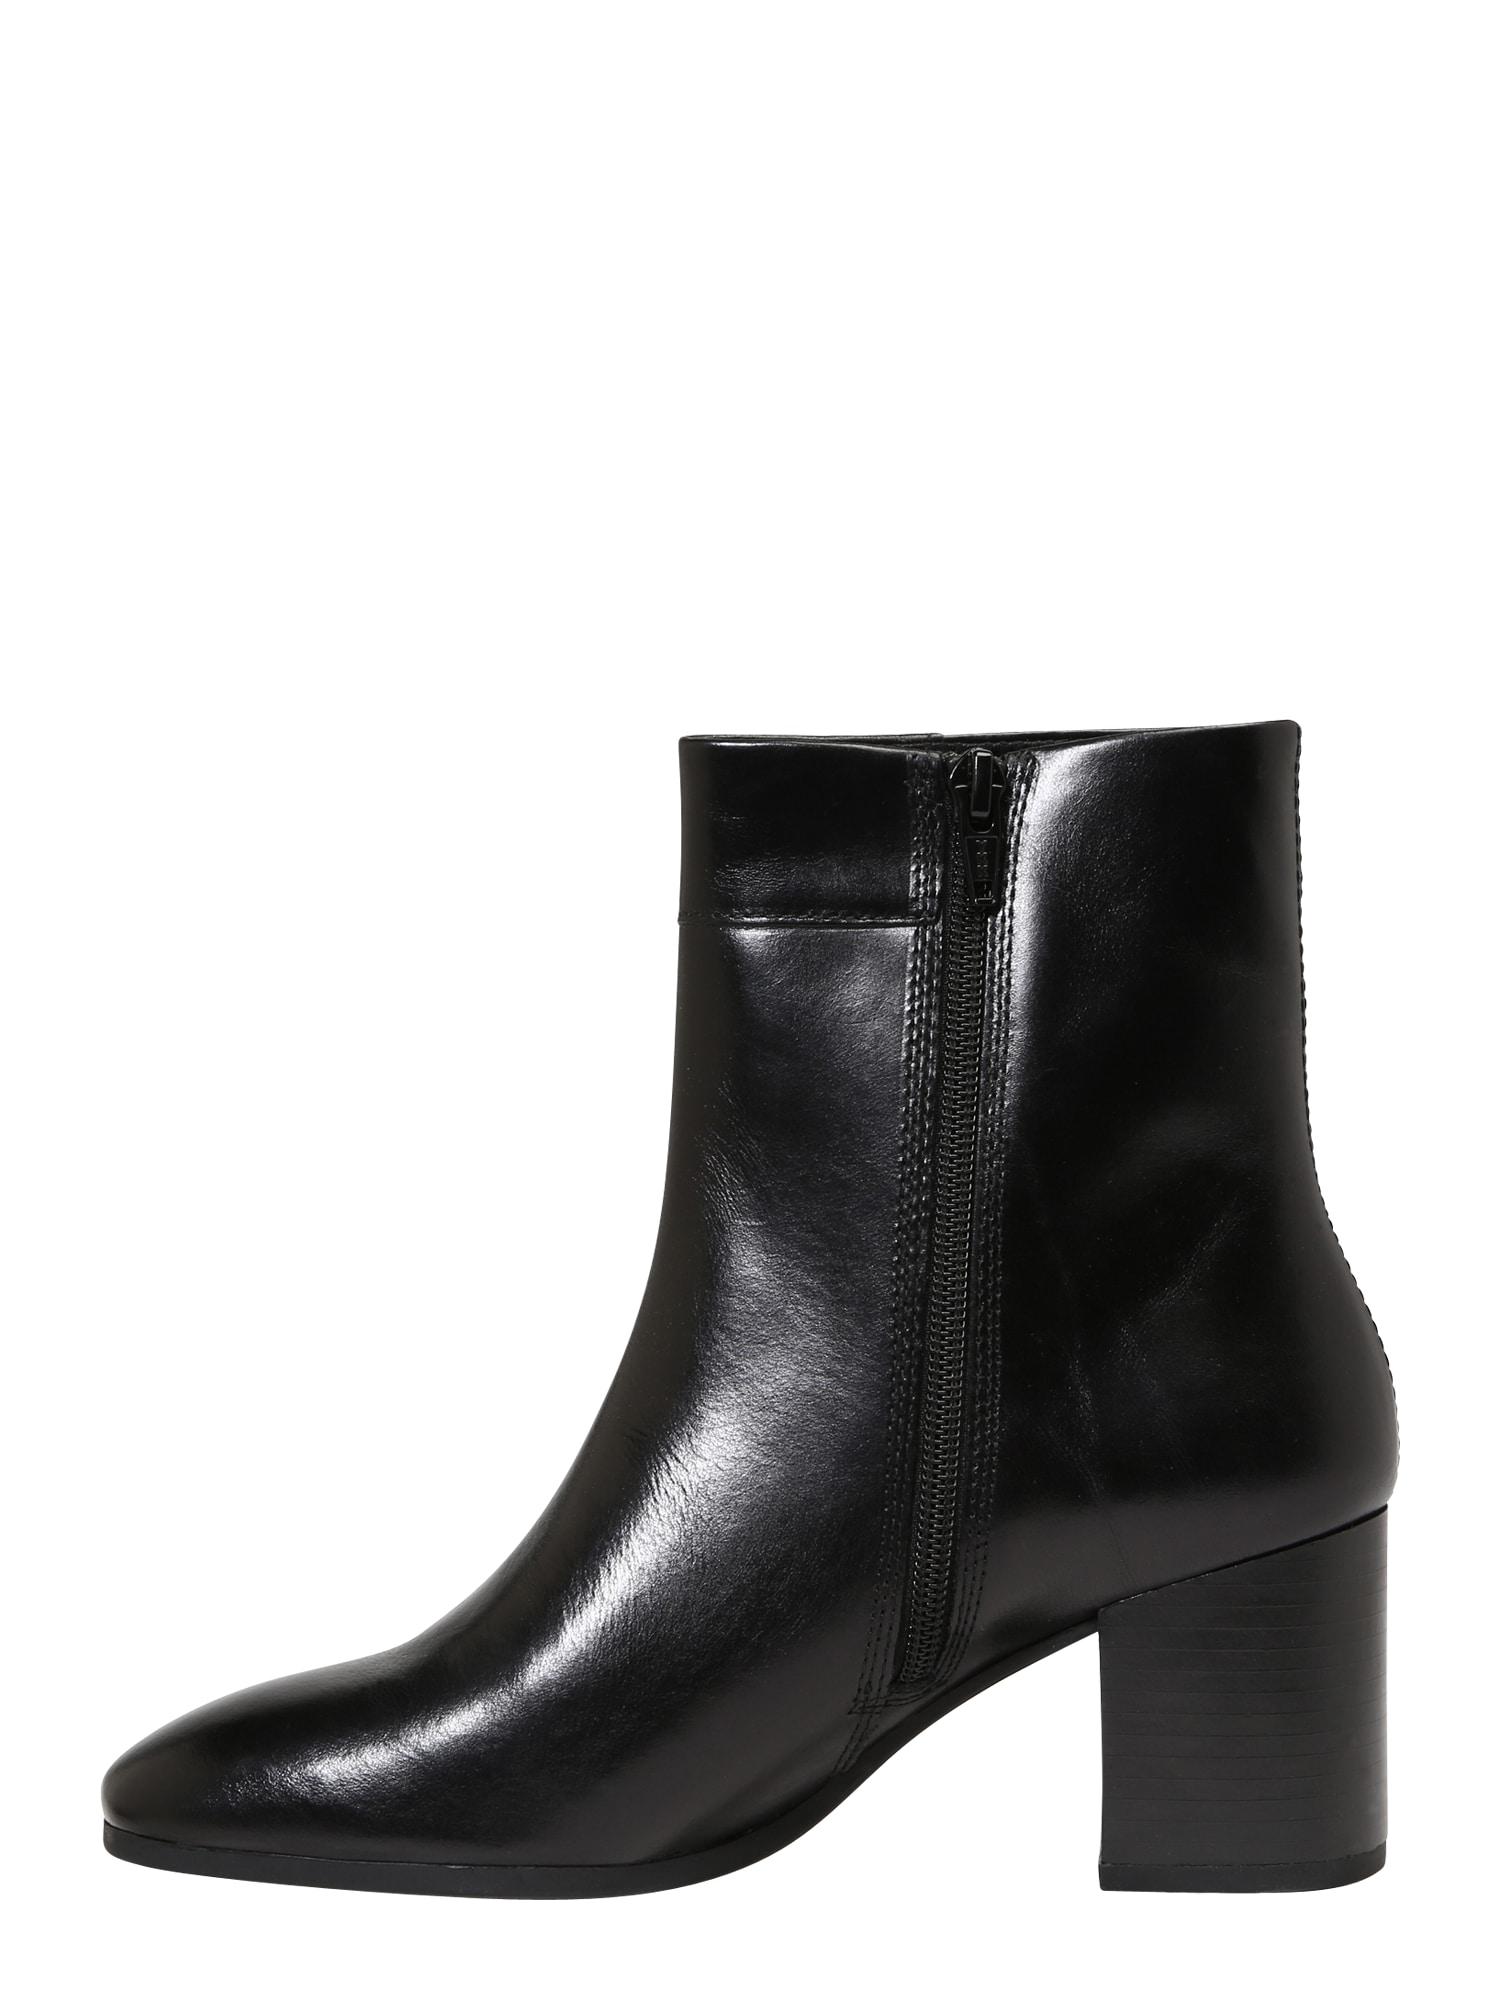 vagabond shoemakers - Stiefelette 'Nicole'